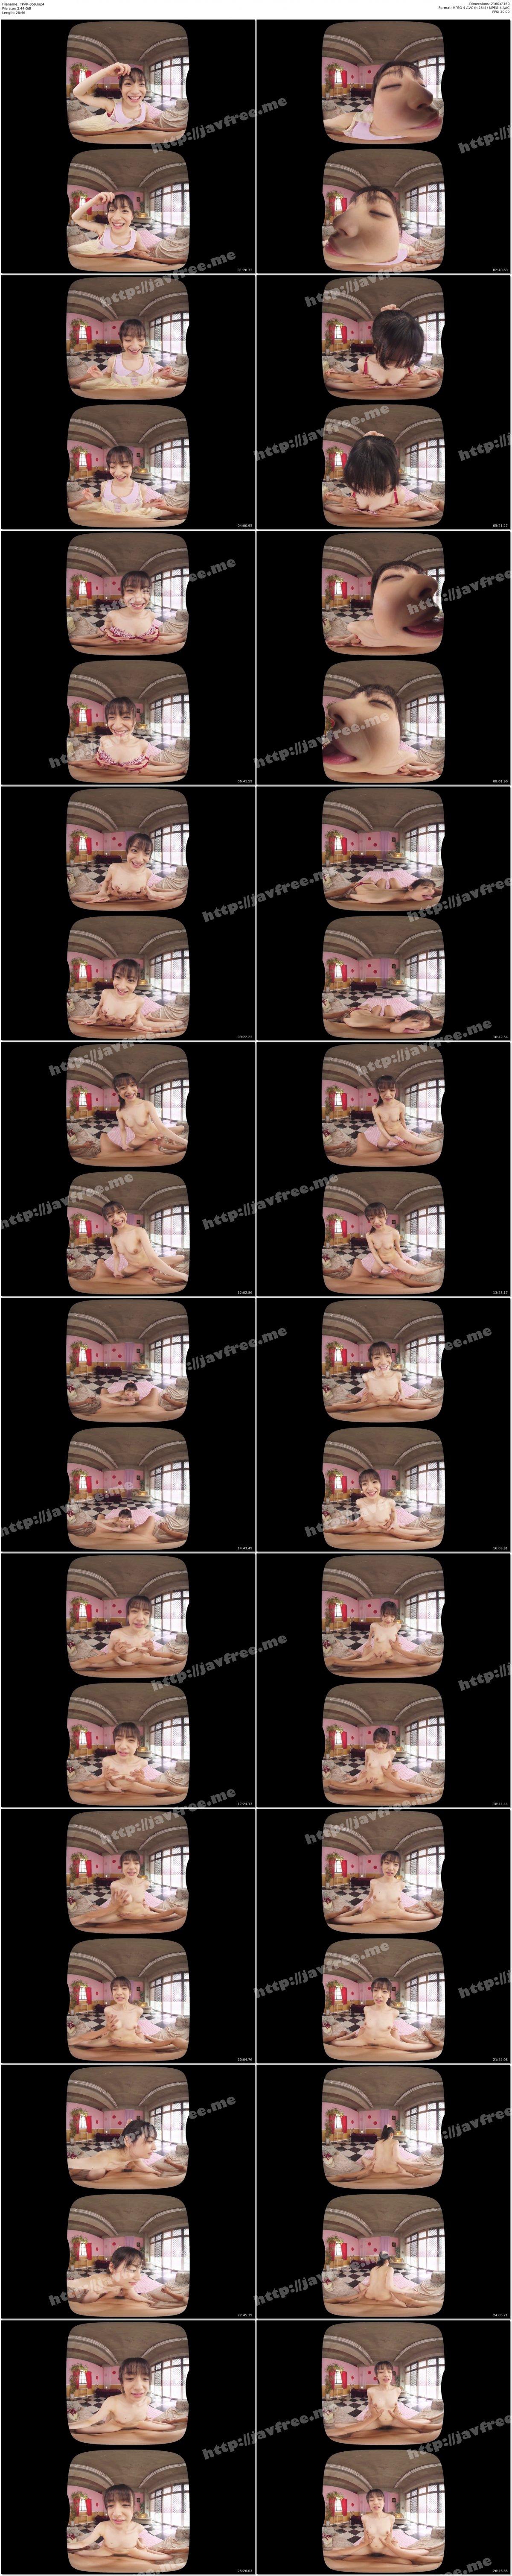 [TPVR-059] 【VR】 ななせ麻衣 イチャイチャしながらチ●ポに跨ると膣奥を貫く程の責めに痙攣昇天。 - image TPVR-059 on https://javfree.me